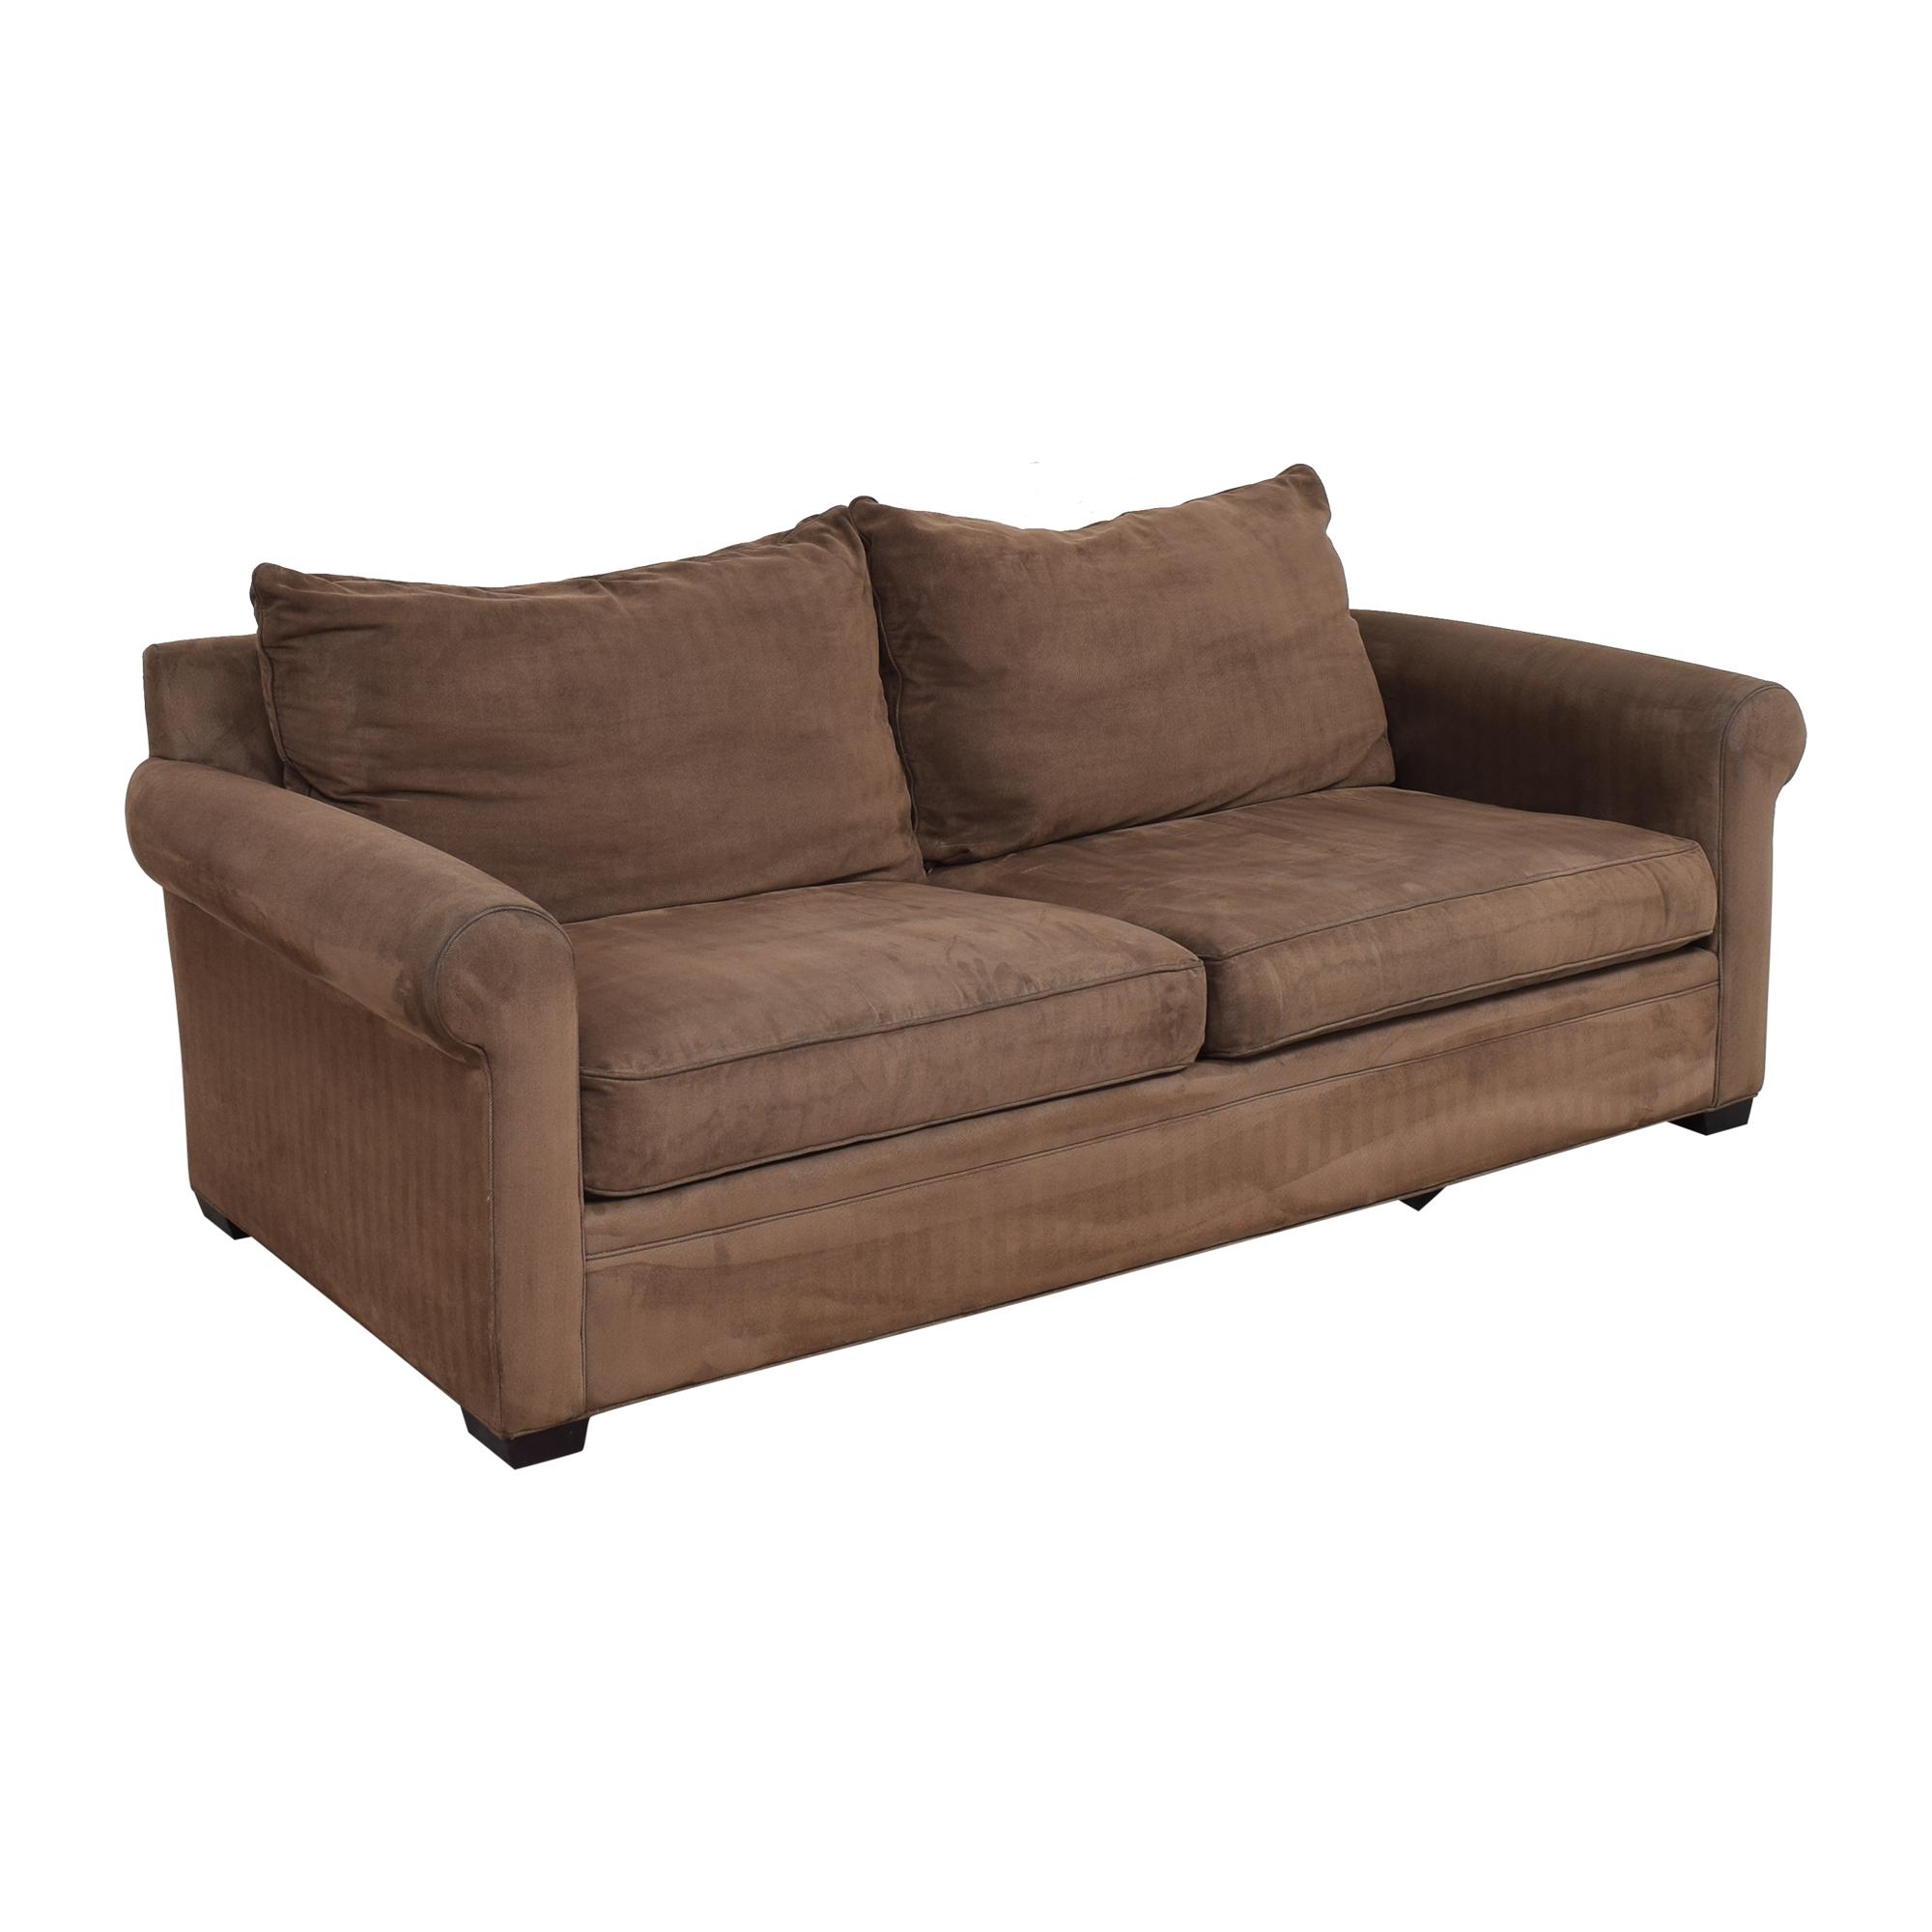 Macy's Modern Concepts Two Cushion Sofa / Classic Sofas